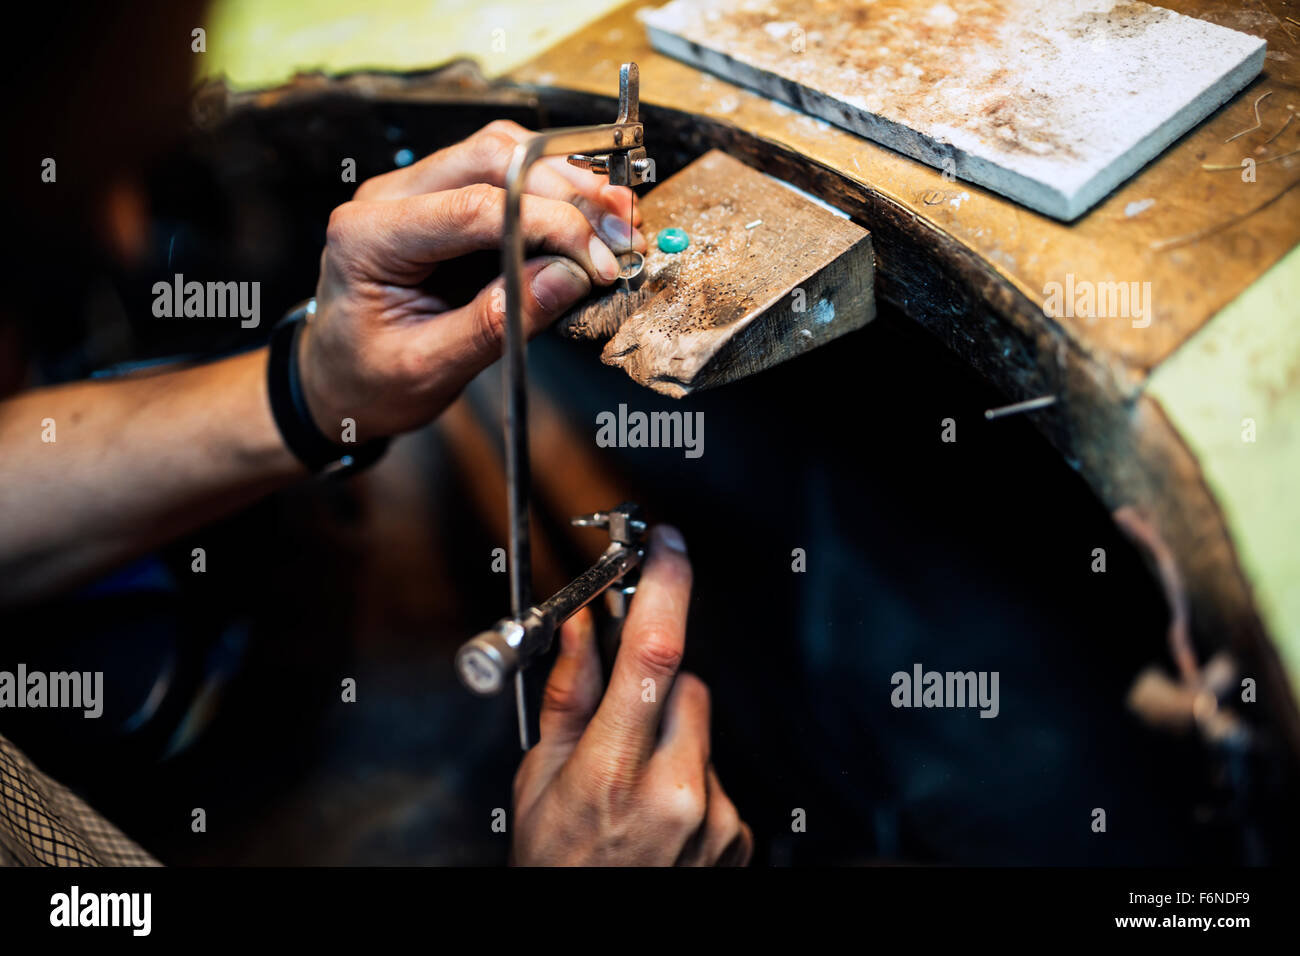 Jeweler using saw to create jewelry - Stock Image